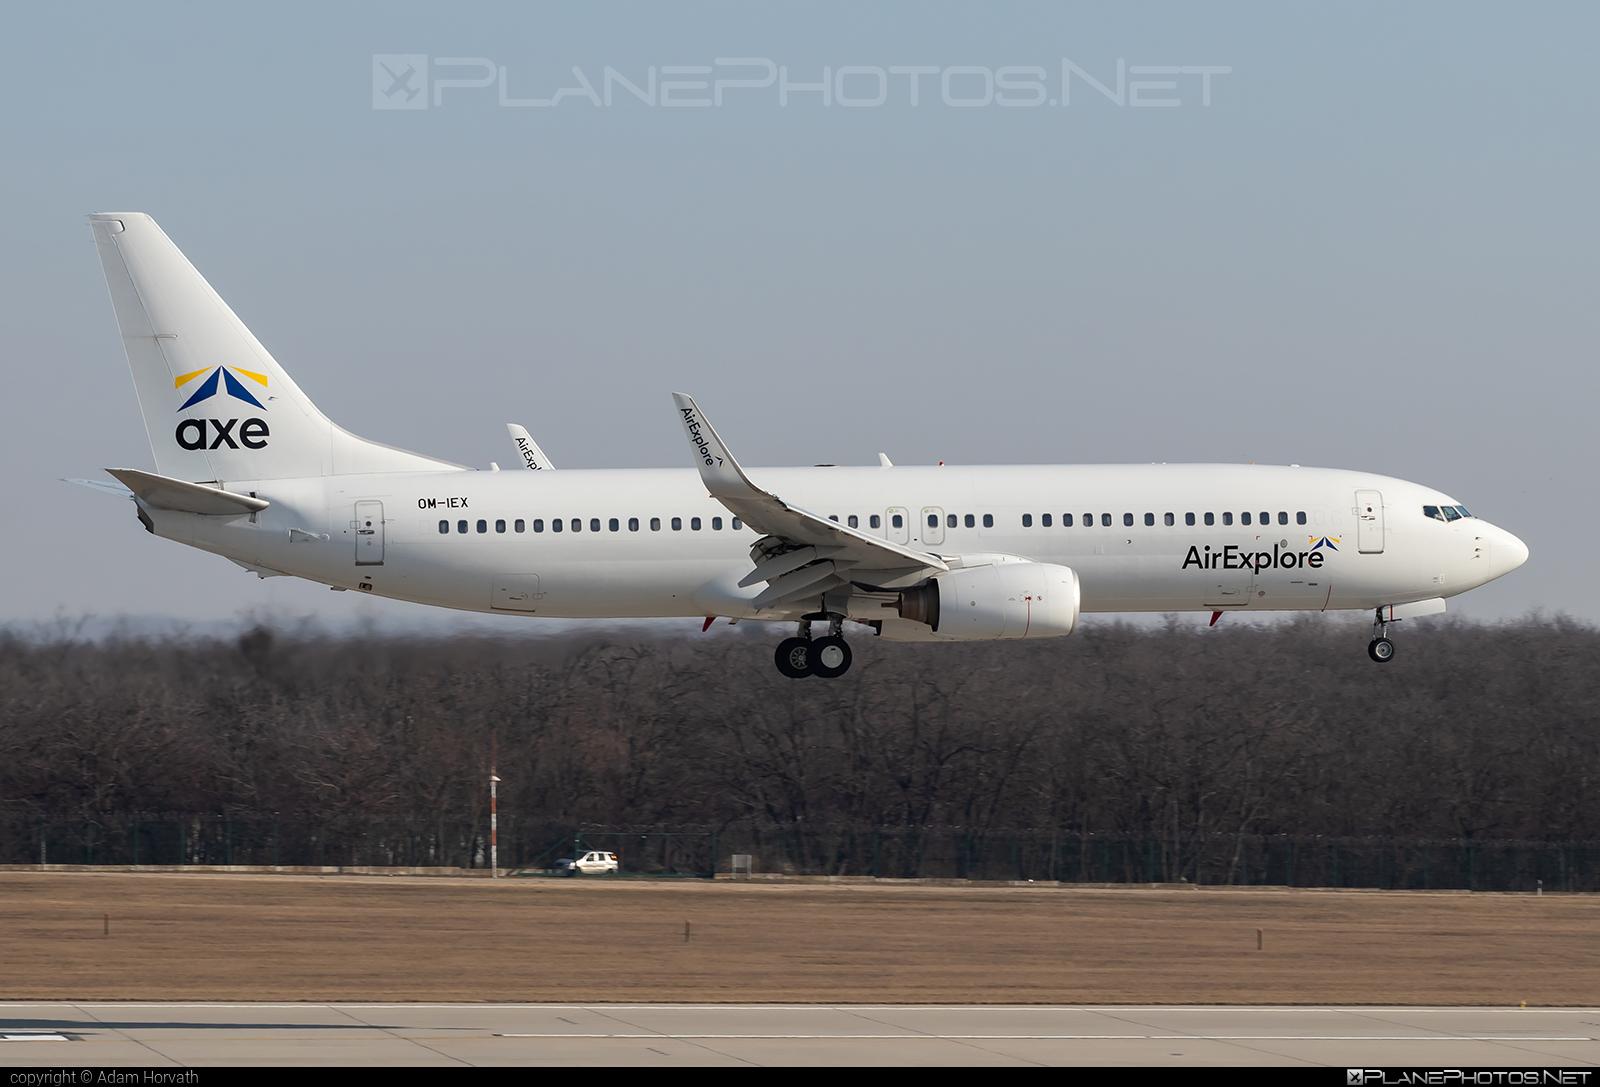 Boeing 737-800 - OM-IEX operated by AirExplore #b737 #b737nextgen #b737ng #boeing #boeing737